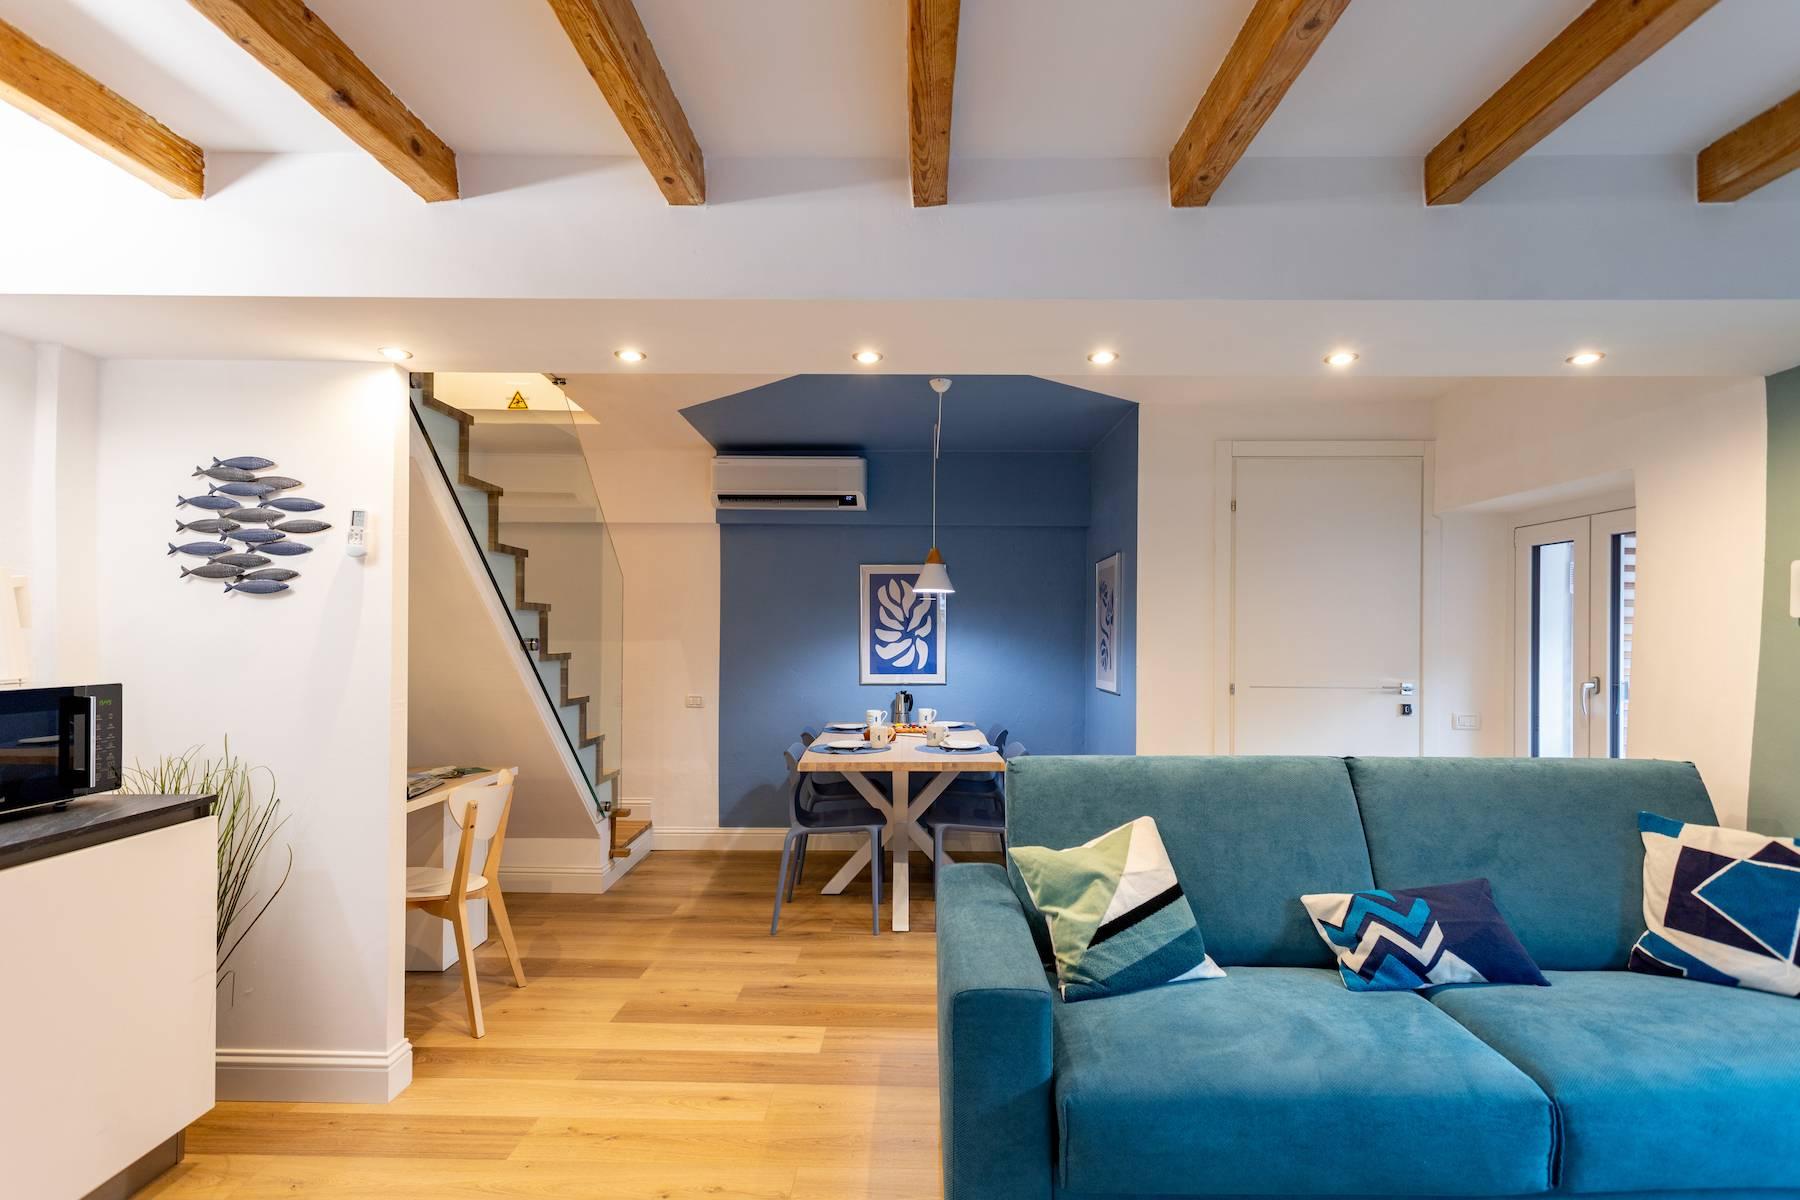 Appartamento in Vendita a Belgirate: 3 locali, 62 mq - Foto 10